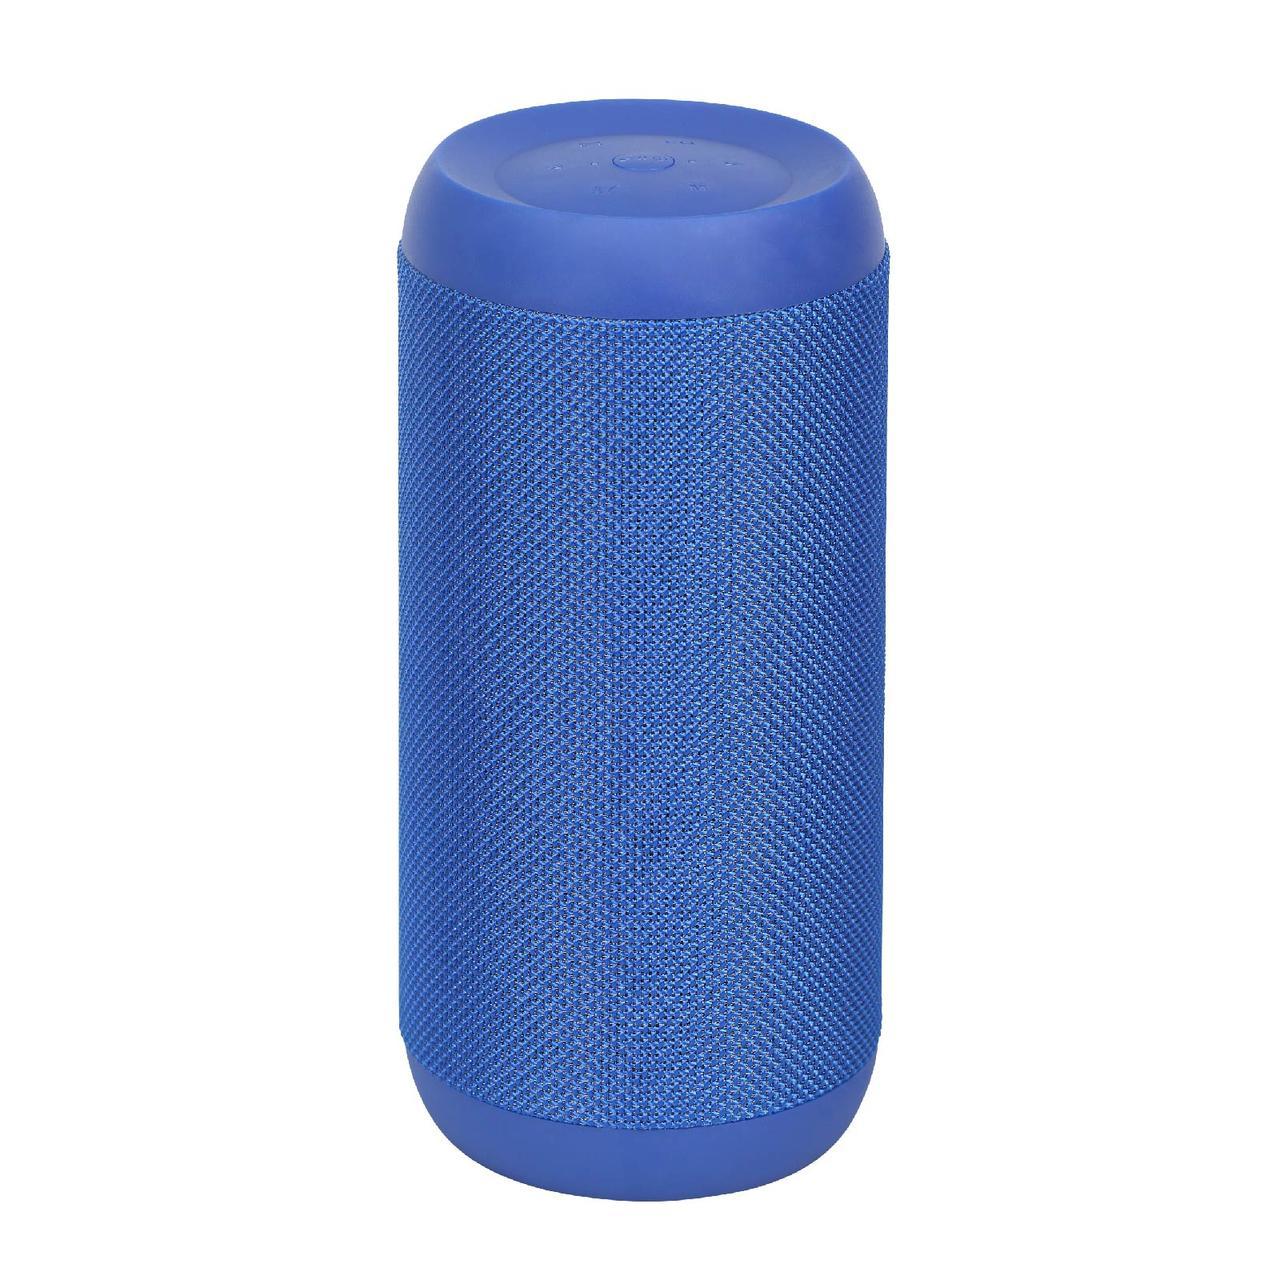 Bluetooth Колонка Promate Silox Синий